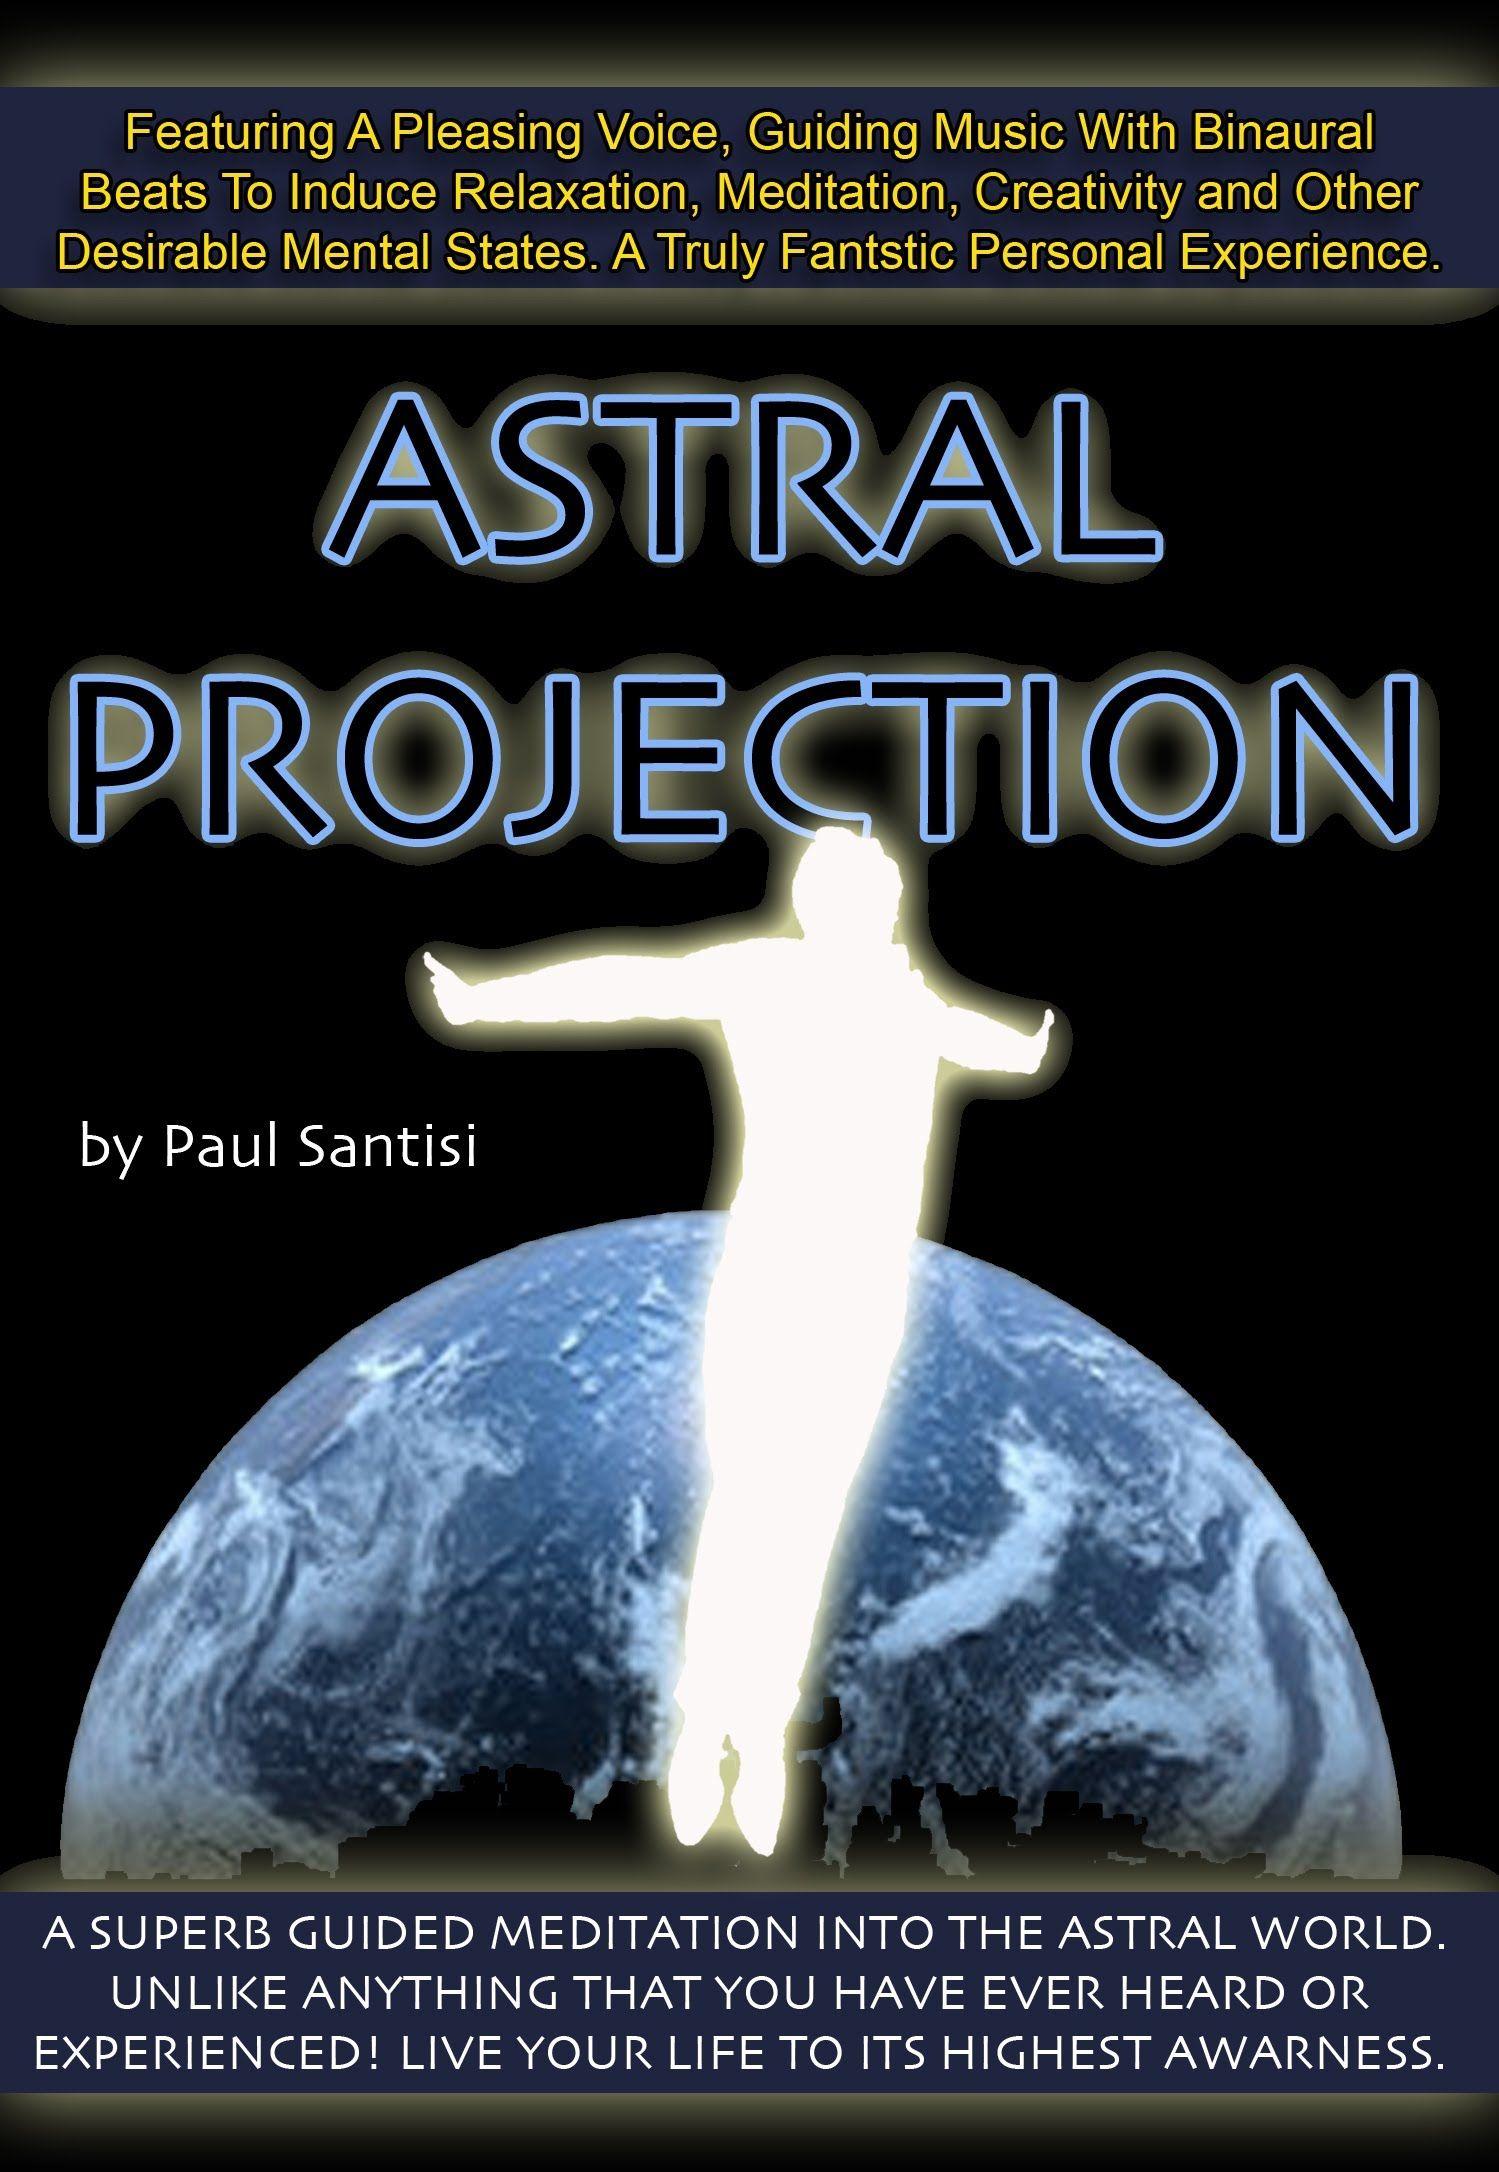 FANTASTIC Astral Projection OOBE Guided Meditation BINAURAL Beats